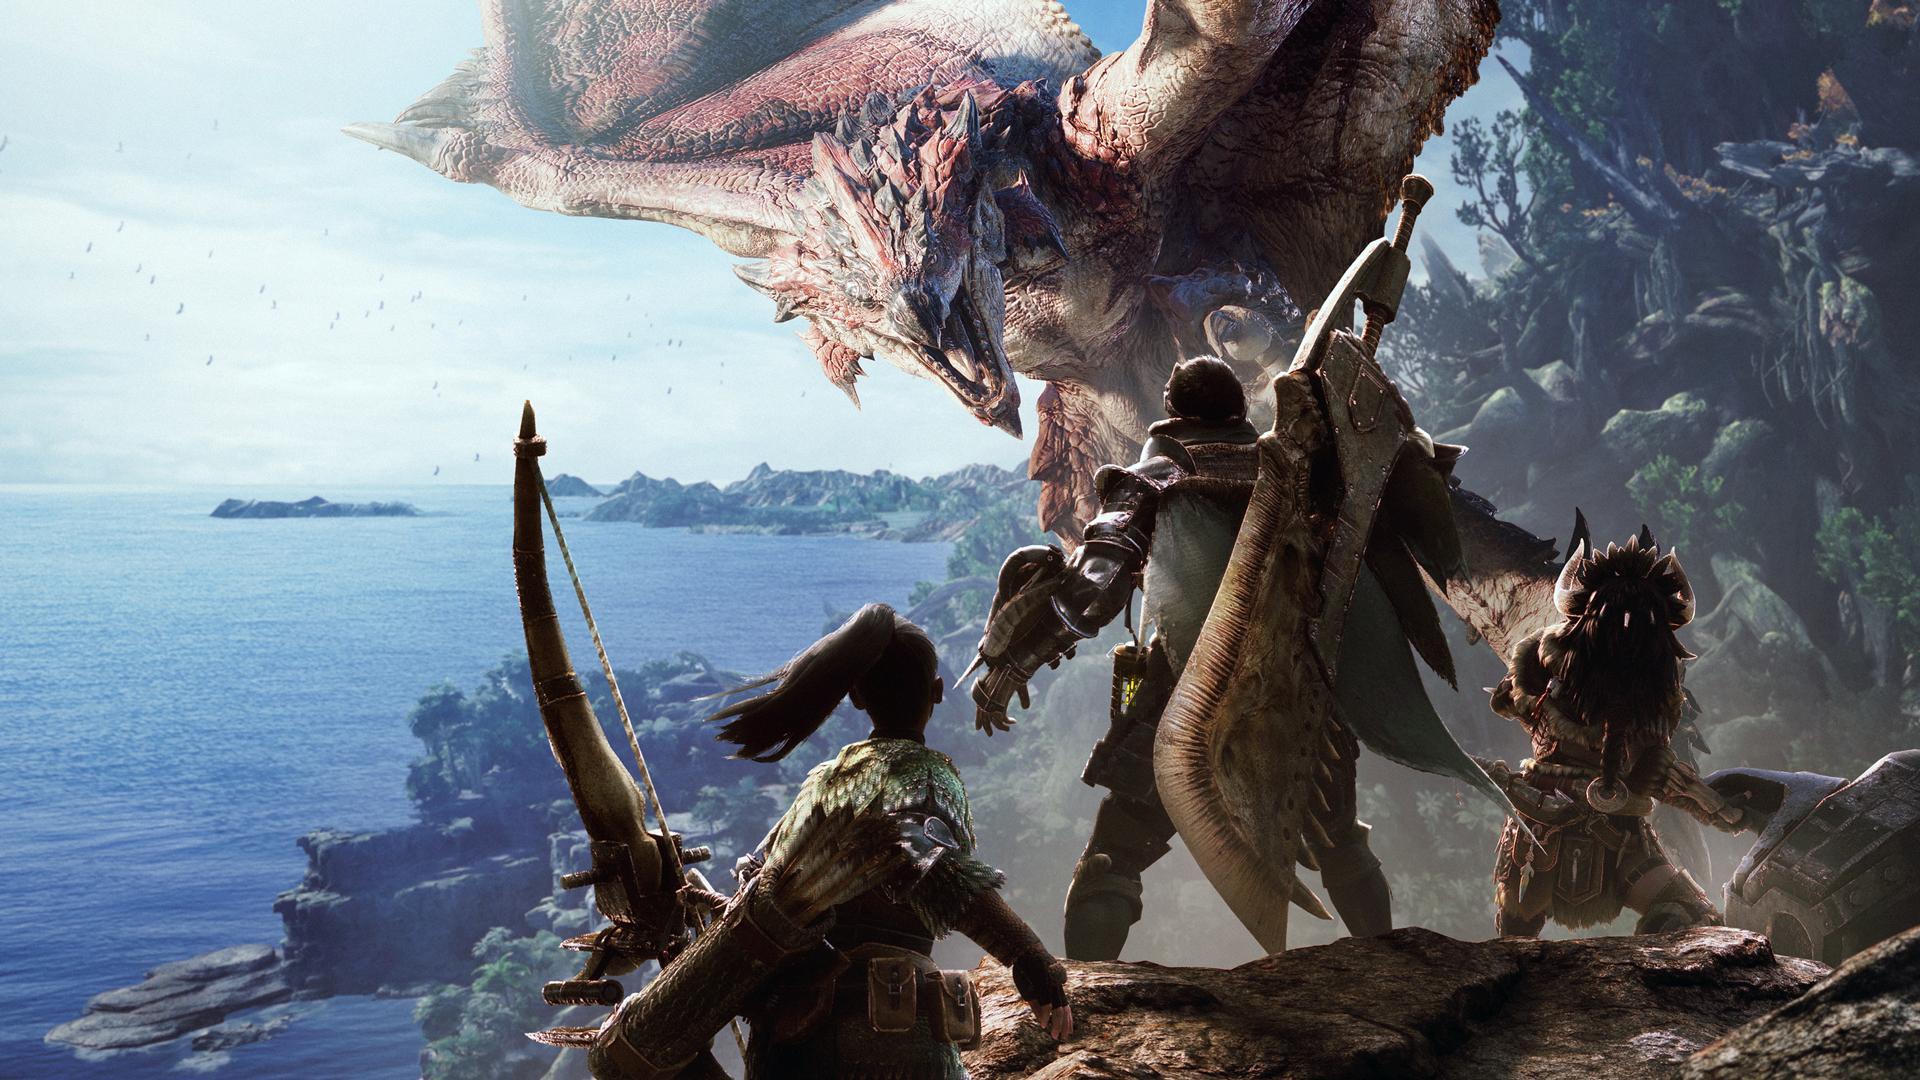 Monster Hunter Wallpapers Top Free Monster Hunter Backgrounds